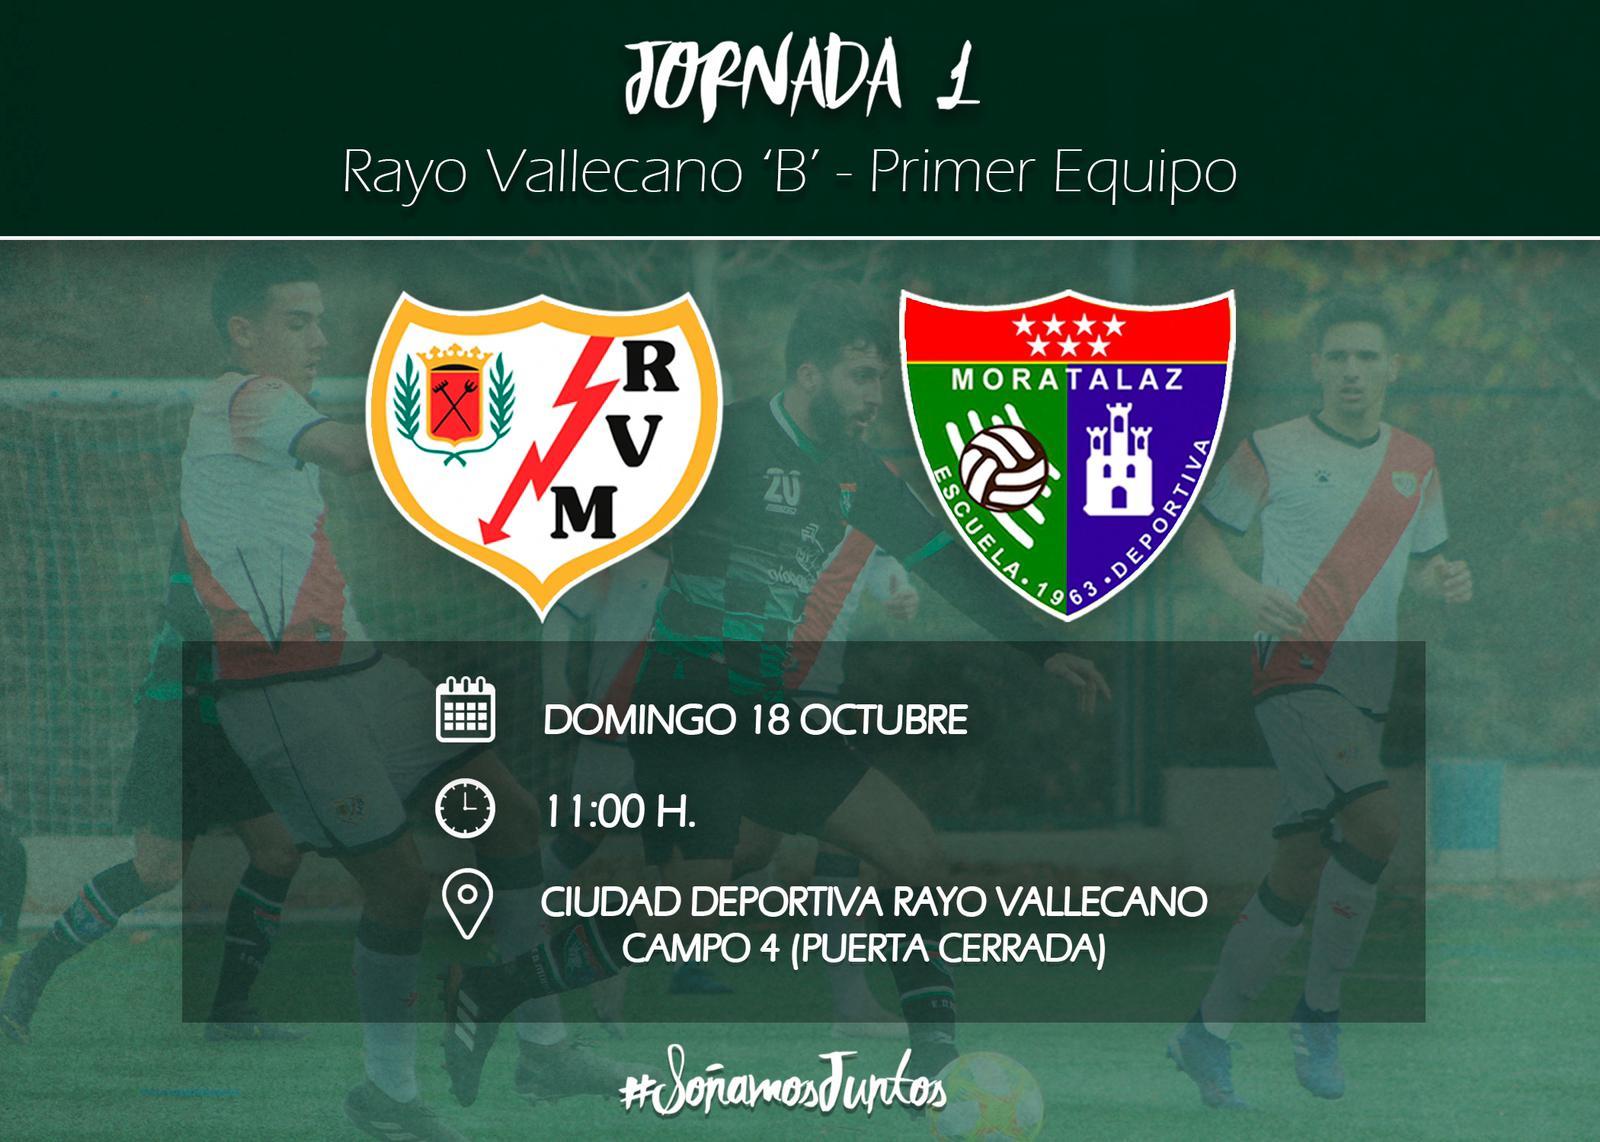 Previa | Rayo Vallecano 'B' – Primer Equipo